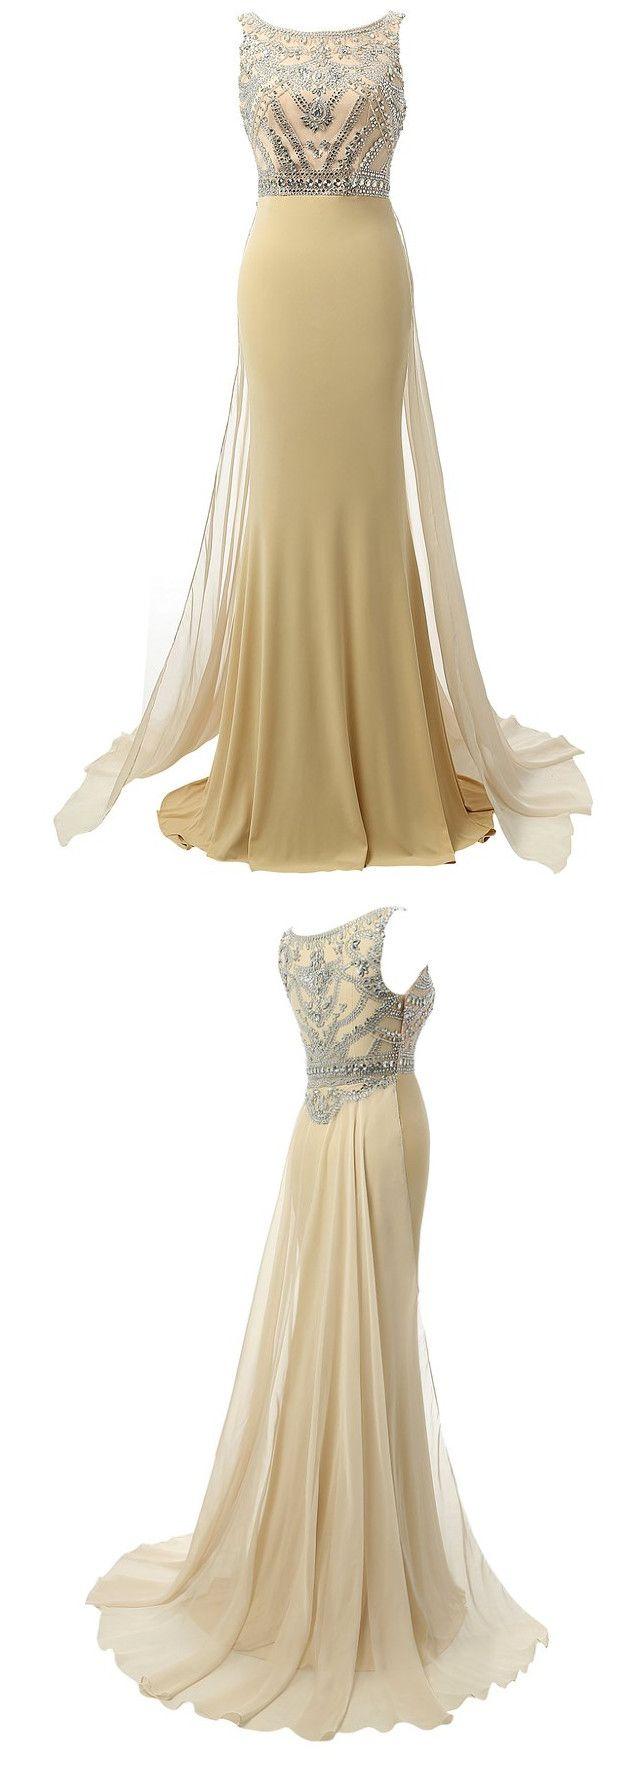 Formal Women Evening Dress Long Prom Dress, Handmade Women's Sleeveless Long Beaded Chiffon Formal Evening Prom Dresses